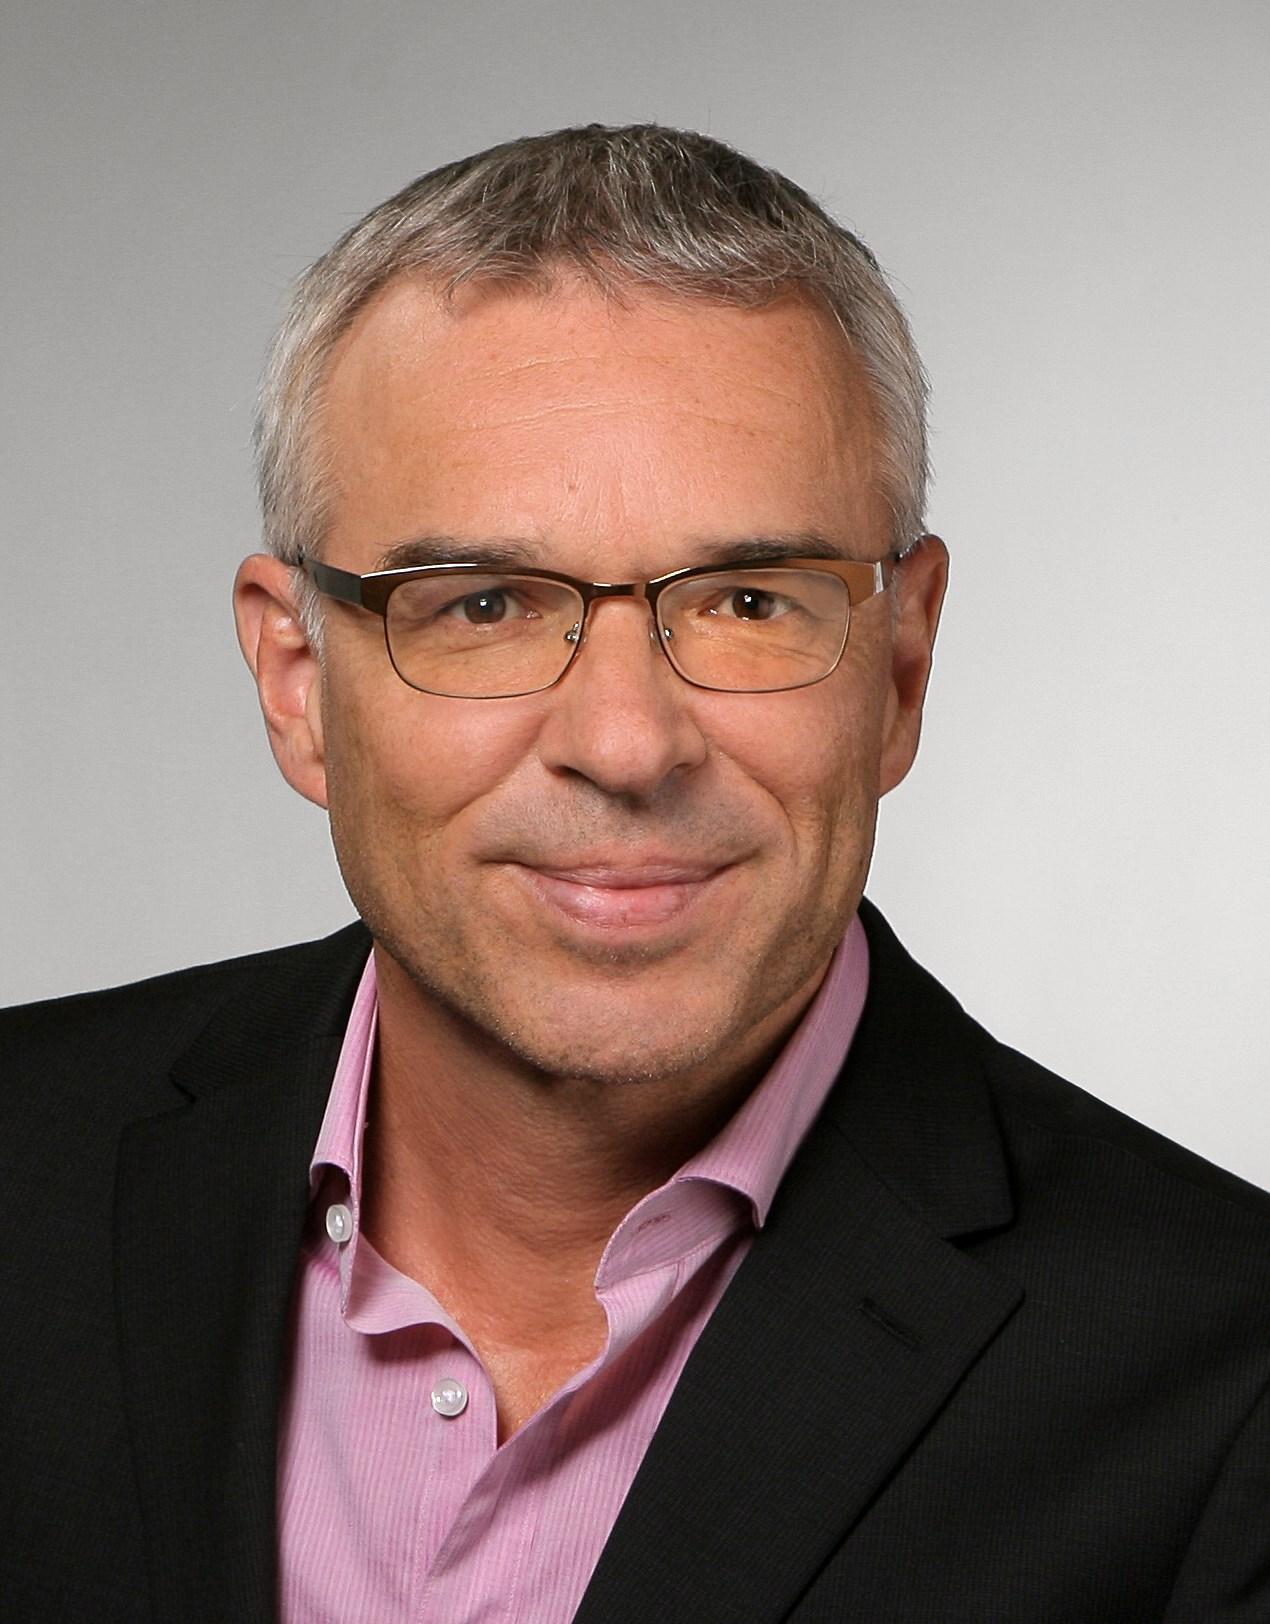 Martin Jeutner Gesundheitskommunikation